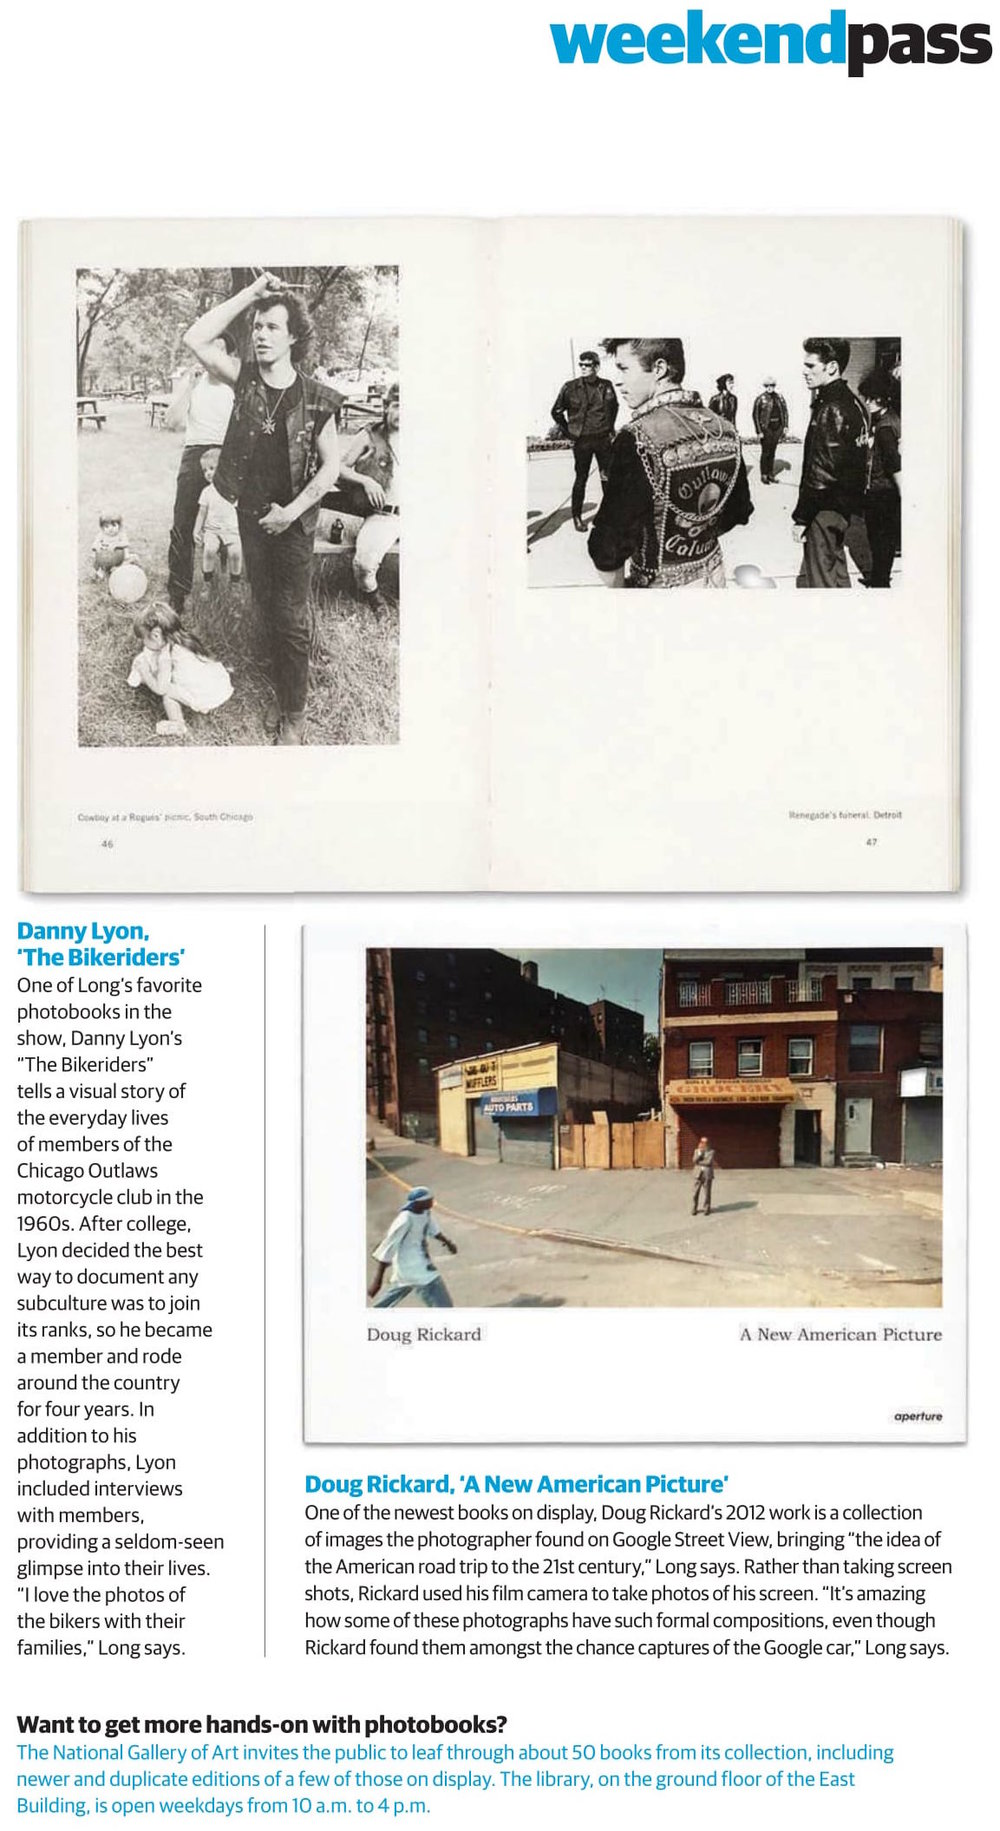 https://www.washingtonpost.com/express/wp/2015/08/06/4-noteworthy-photobooks-from-the-national-gallerys-photobooks-after-frank-exhibit